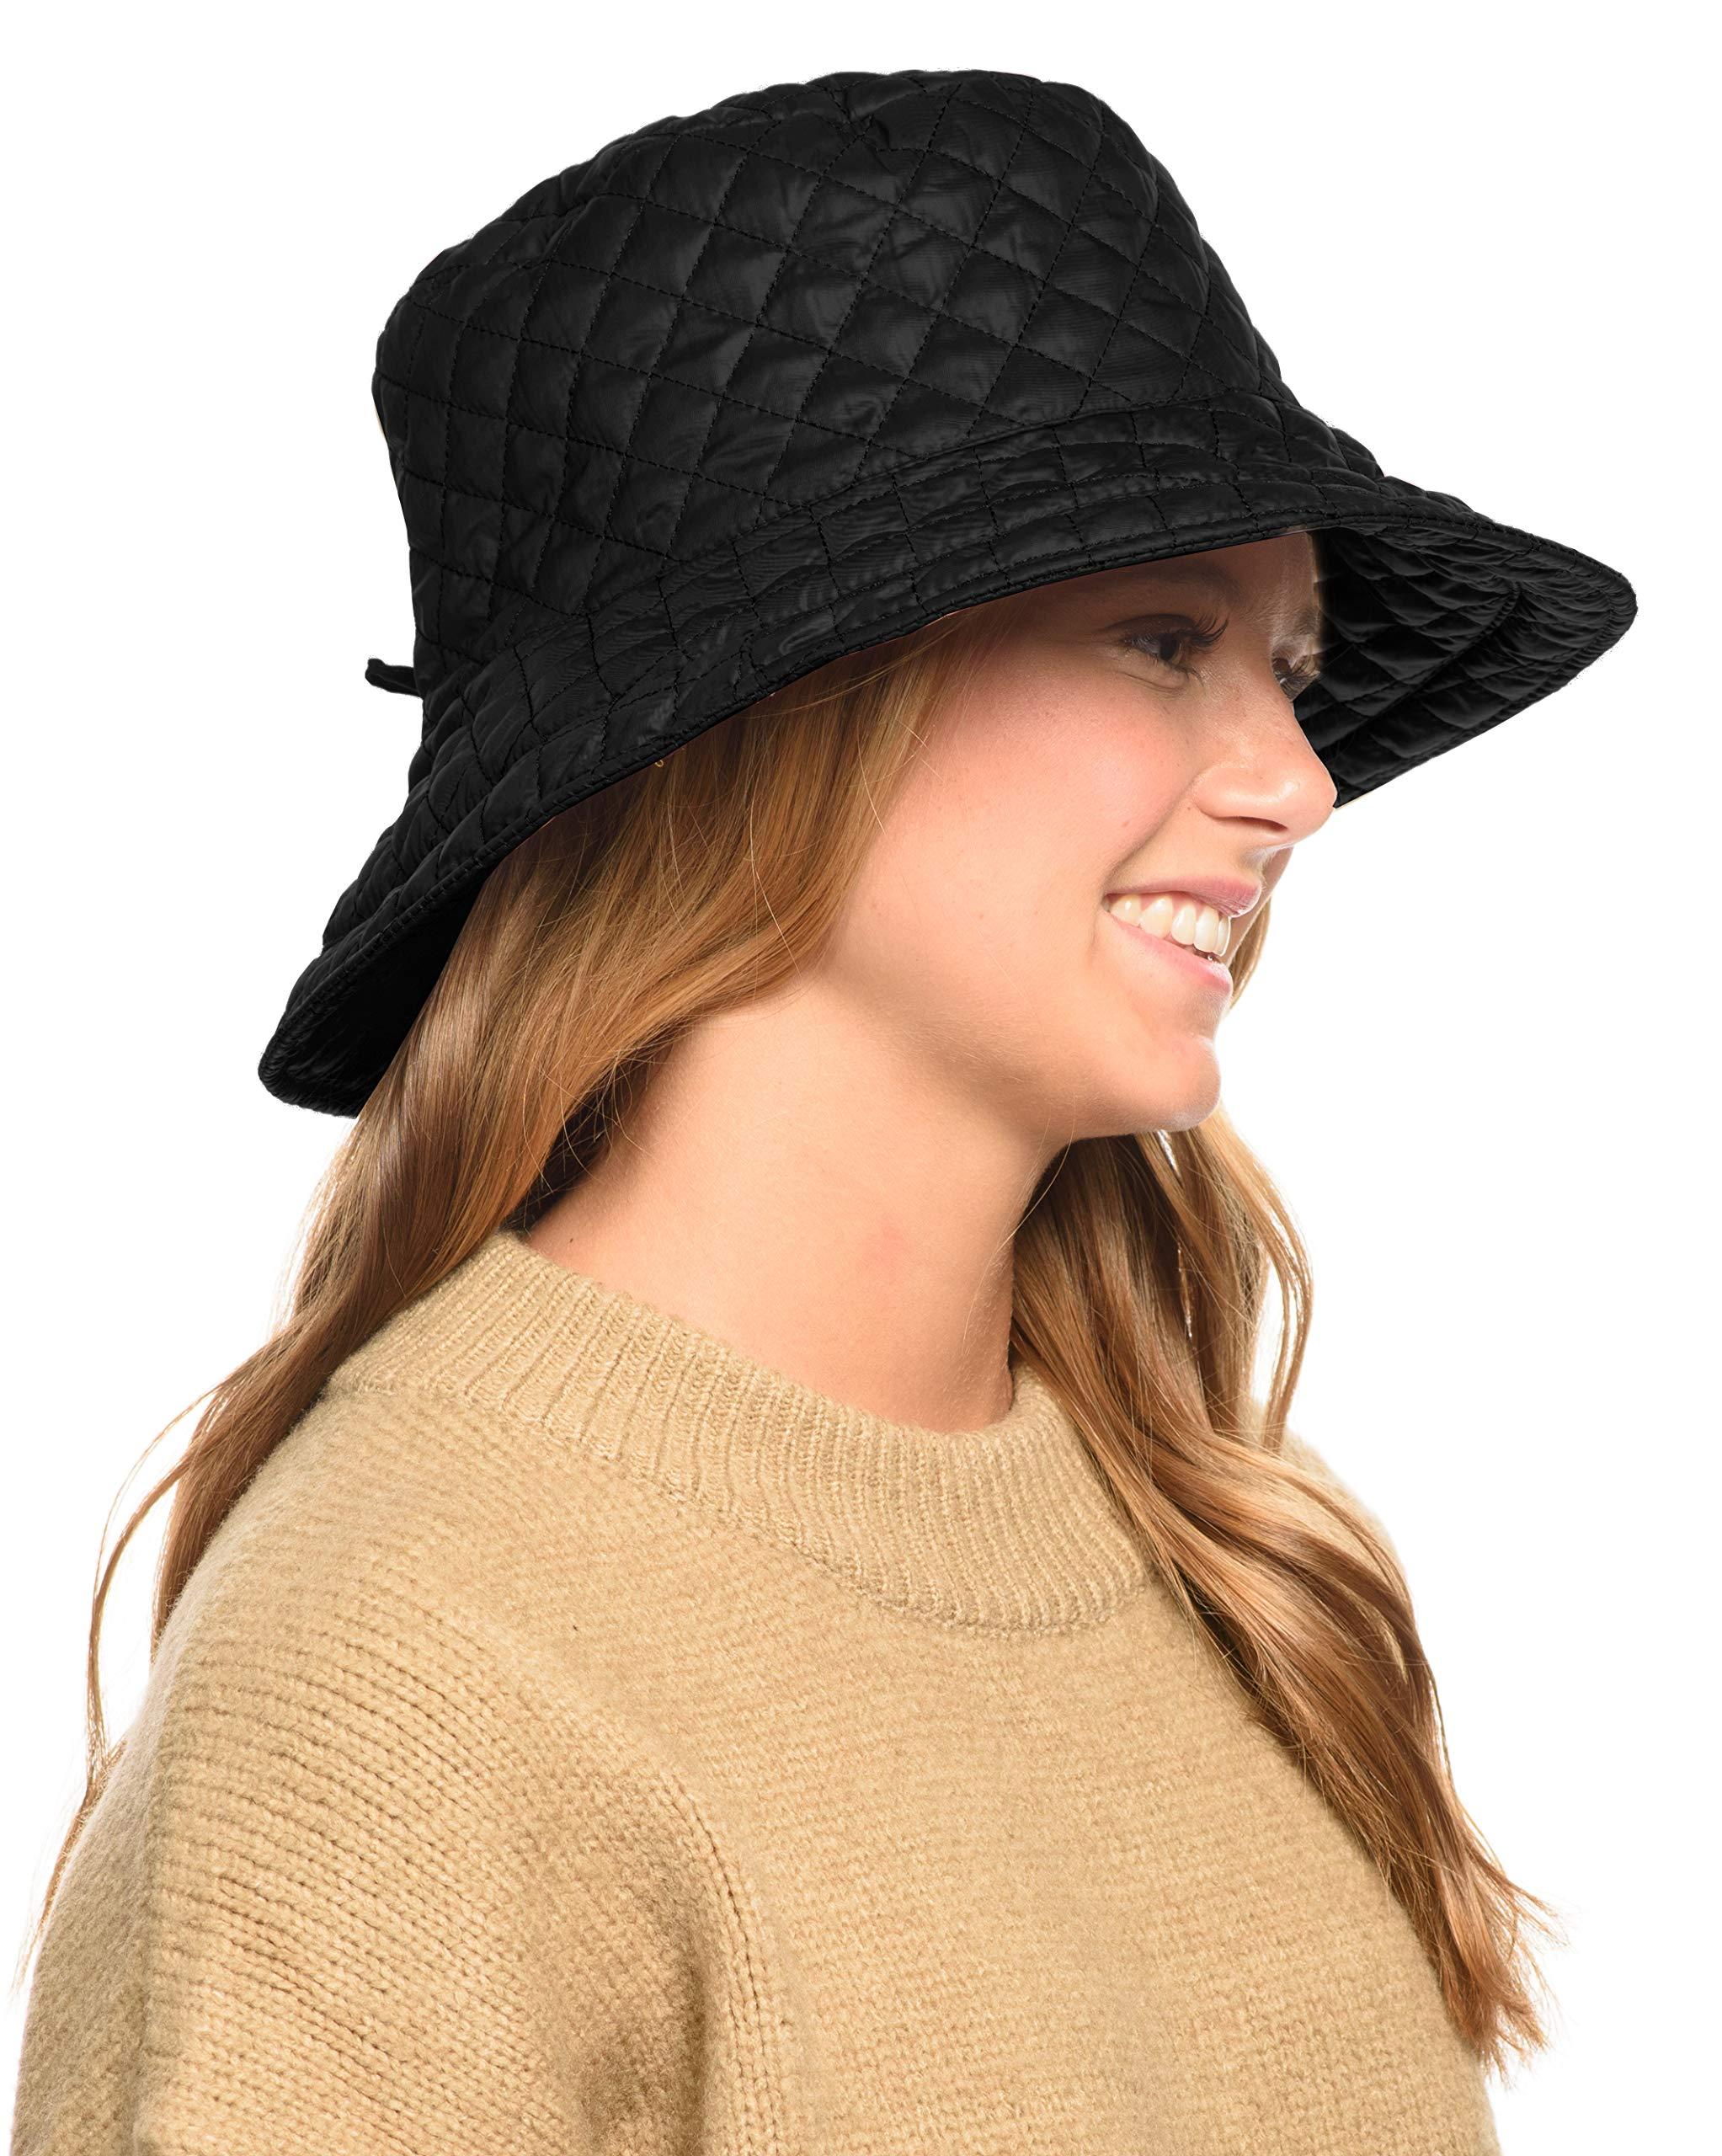 ANGELA & WILLIAM Foldable Water Repellent Quilted Rain Hat w/Adjustable Drawstring, Bucket Cap (Black)